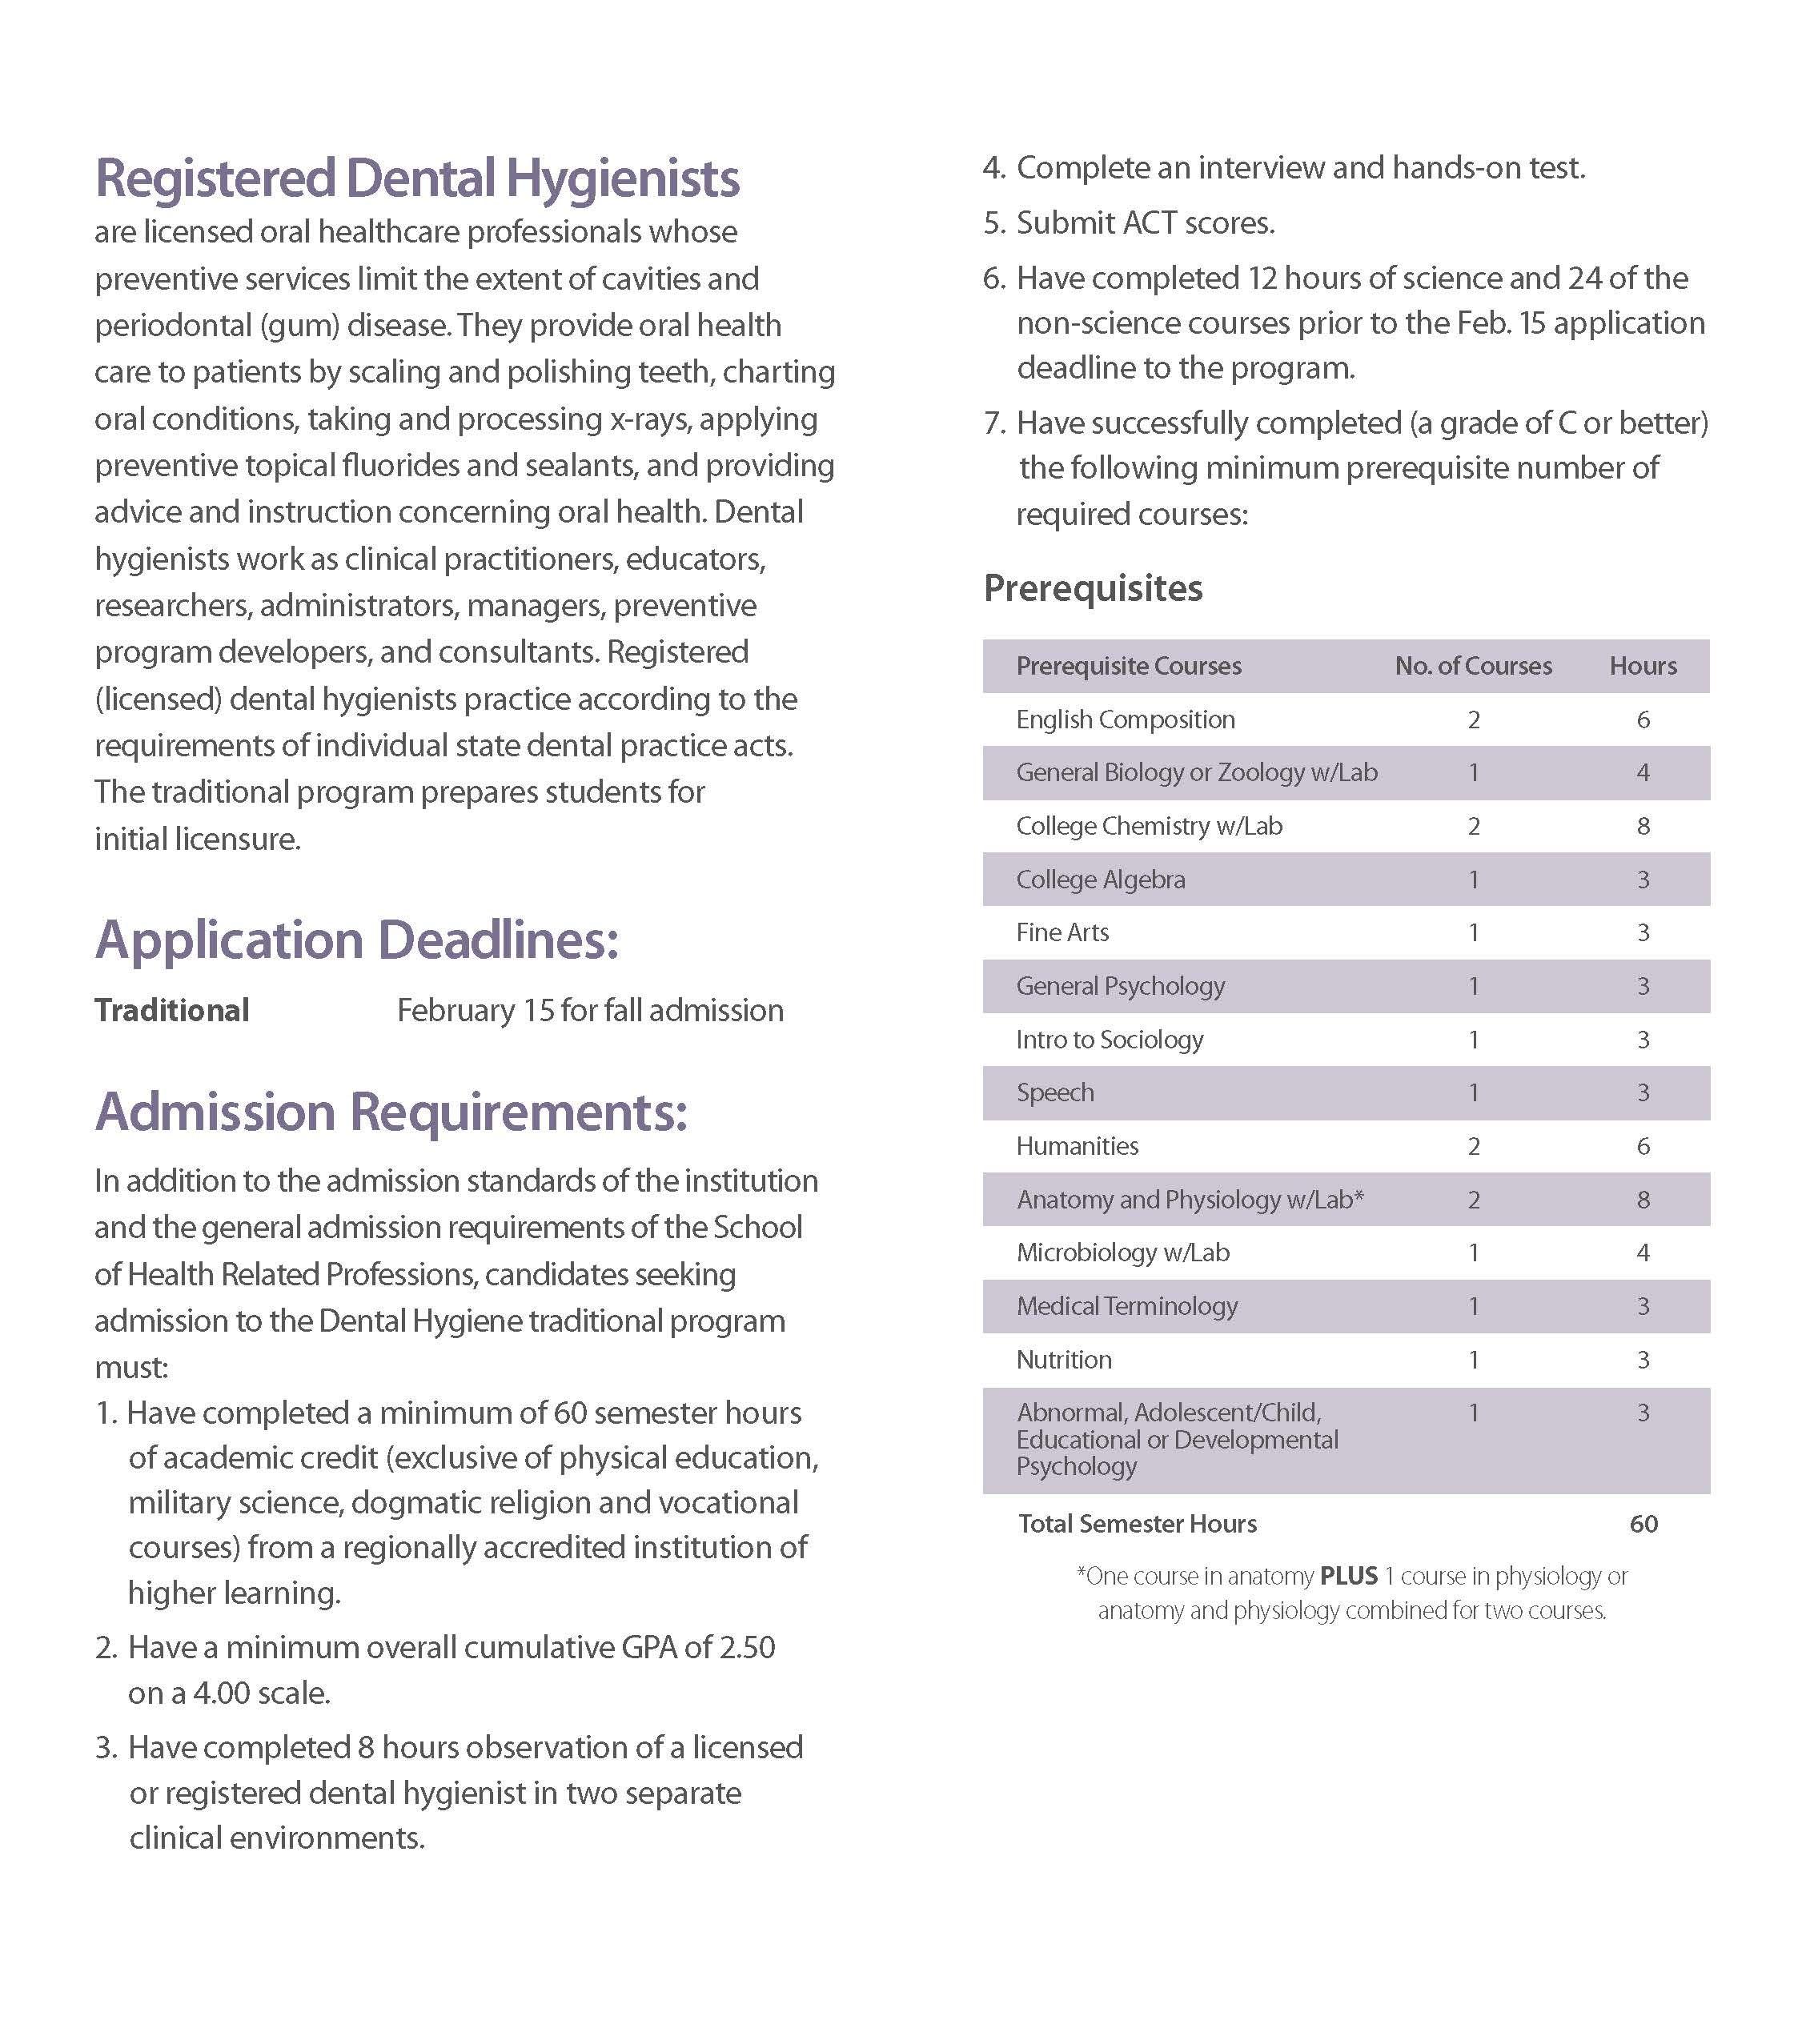 UMMC School of Health Related Professions Dental Hygiene